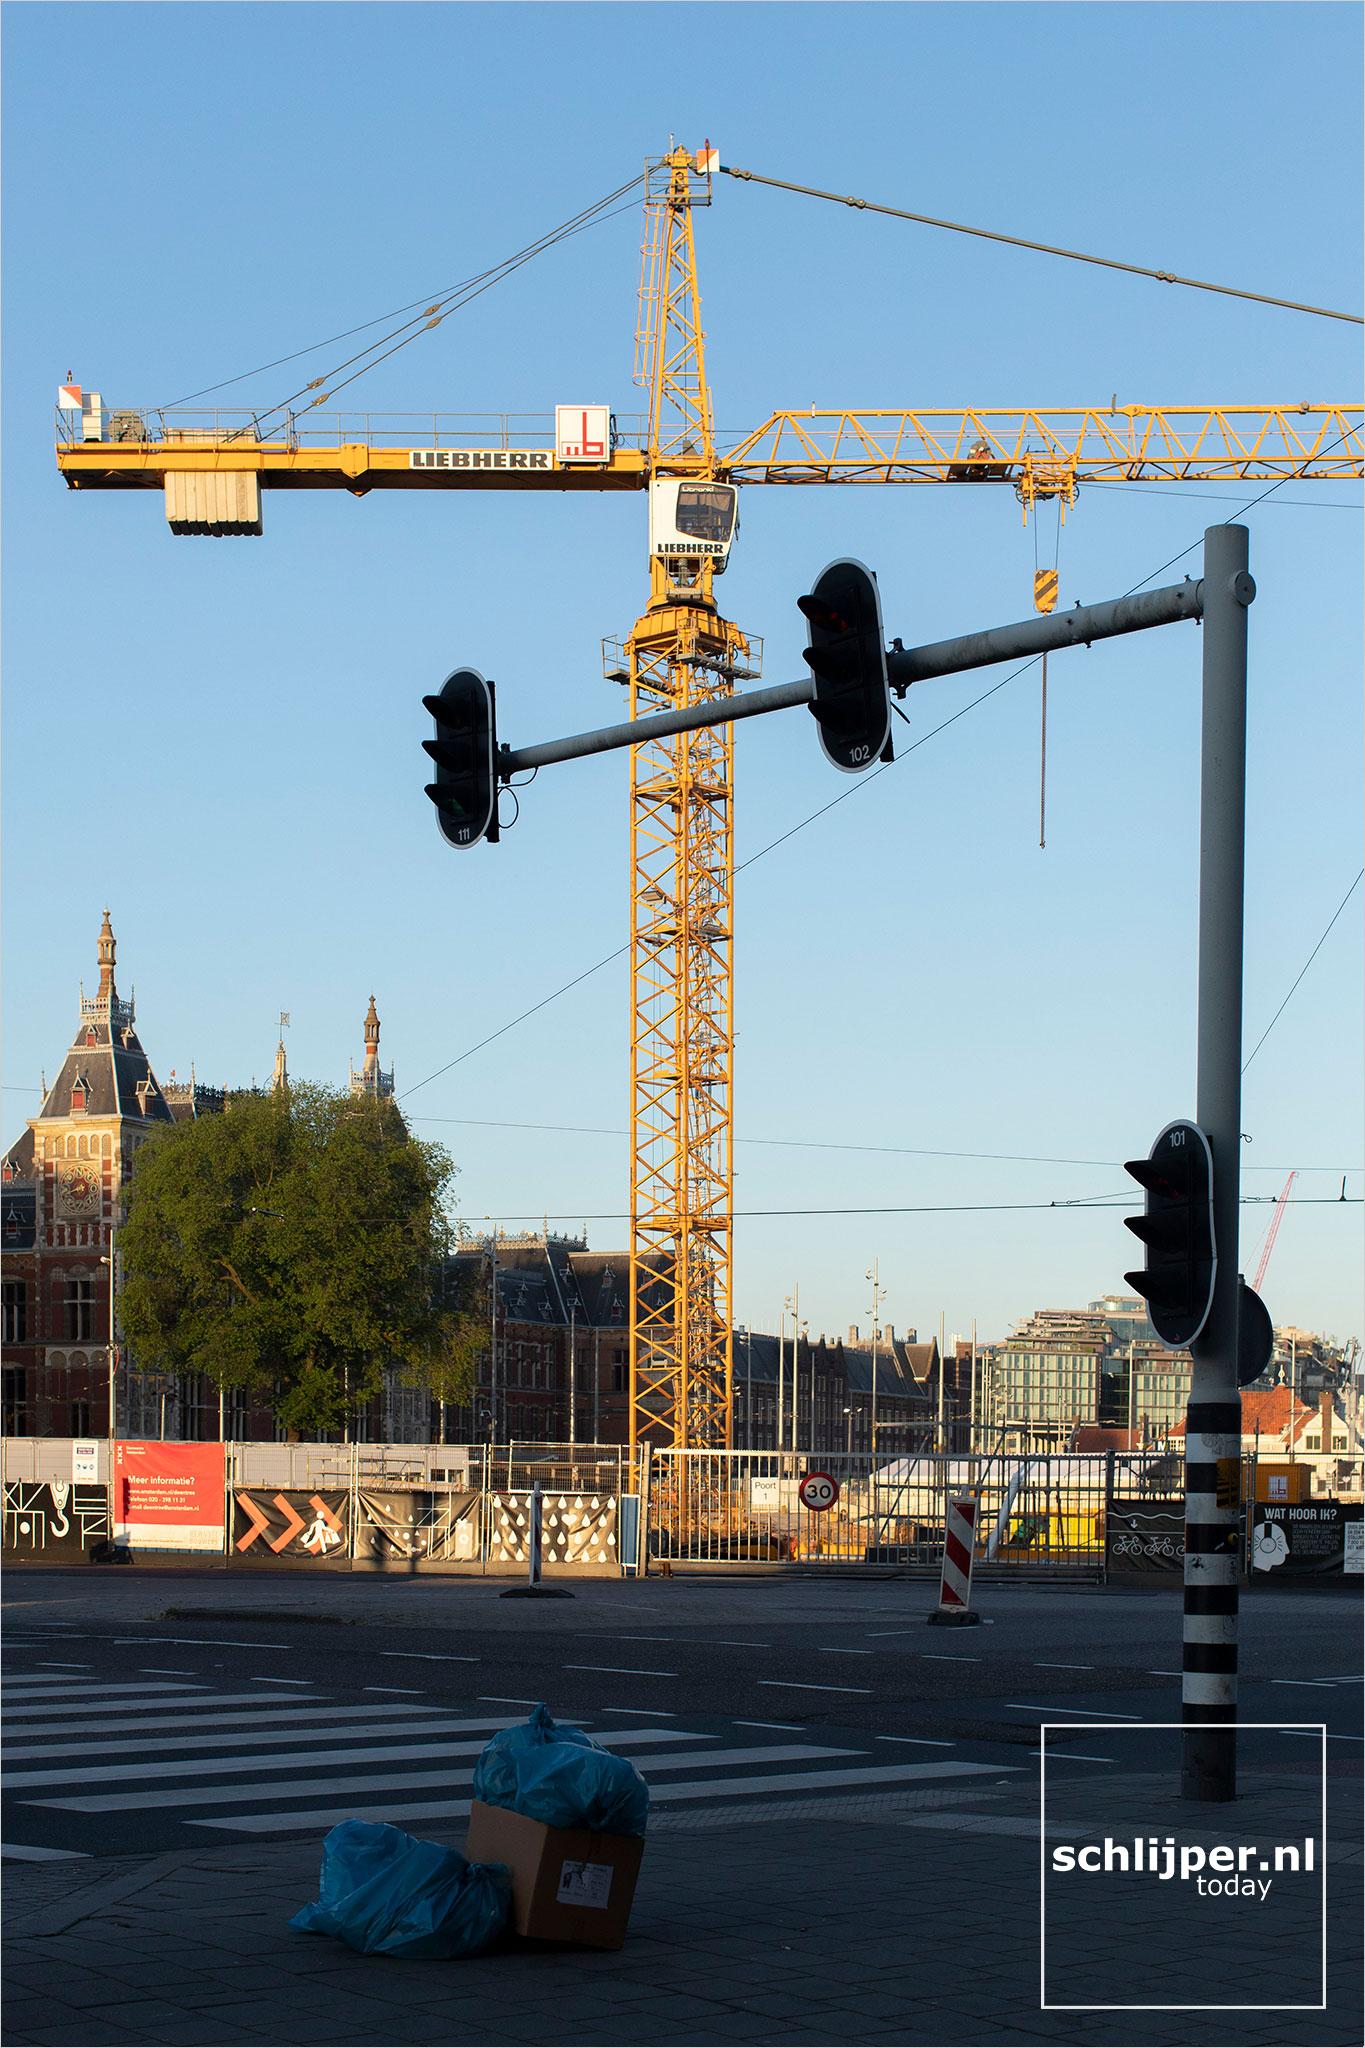 The Netherlands, Amsterdam, 13 juni 2021